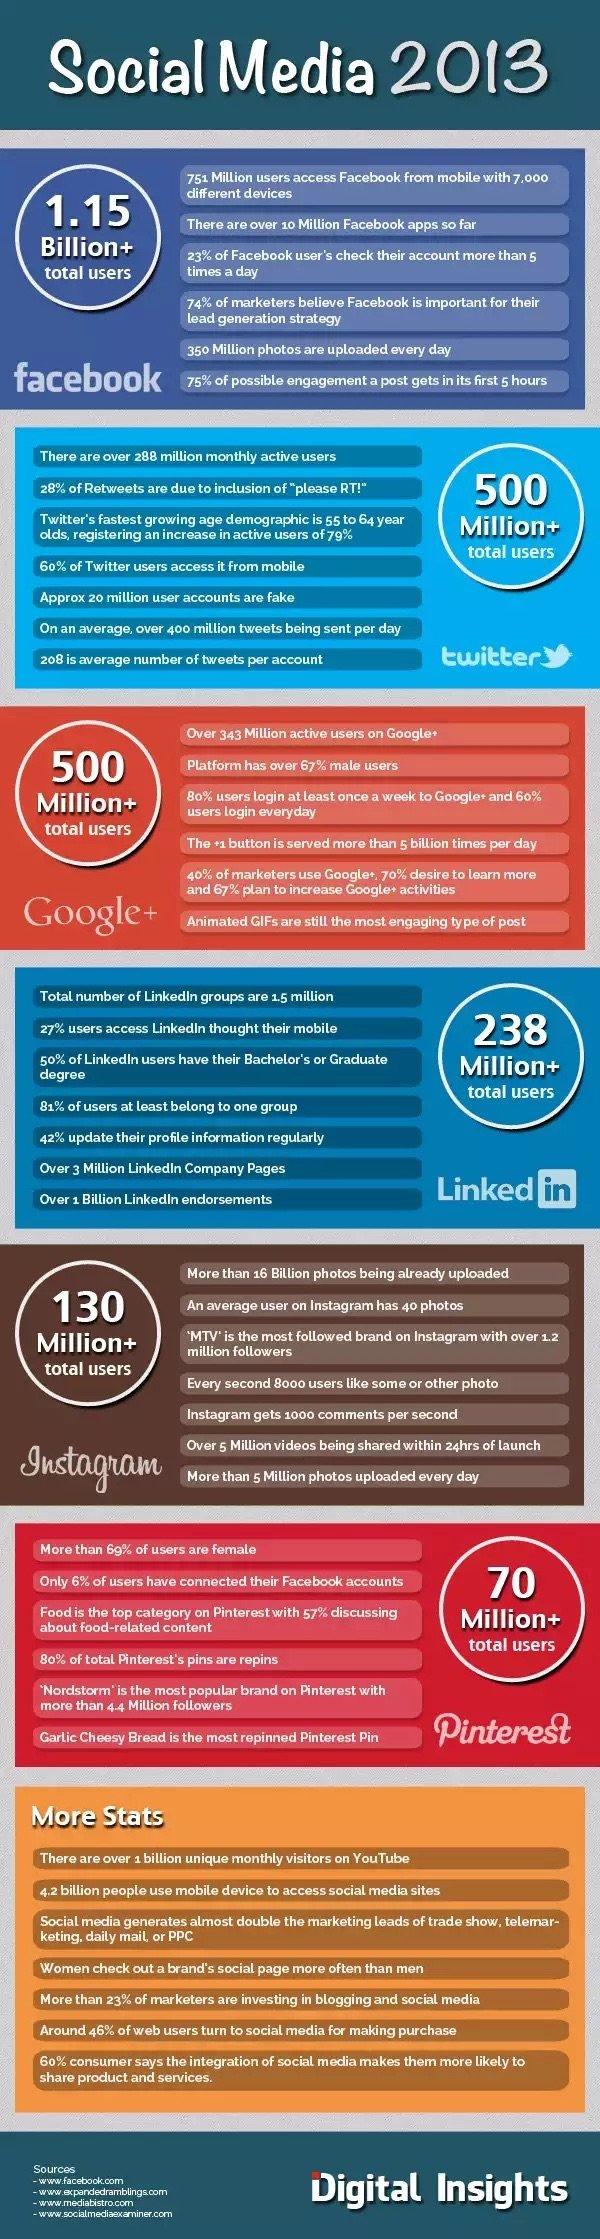 Social Media Statistics 2013 #Infographic